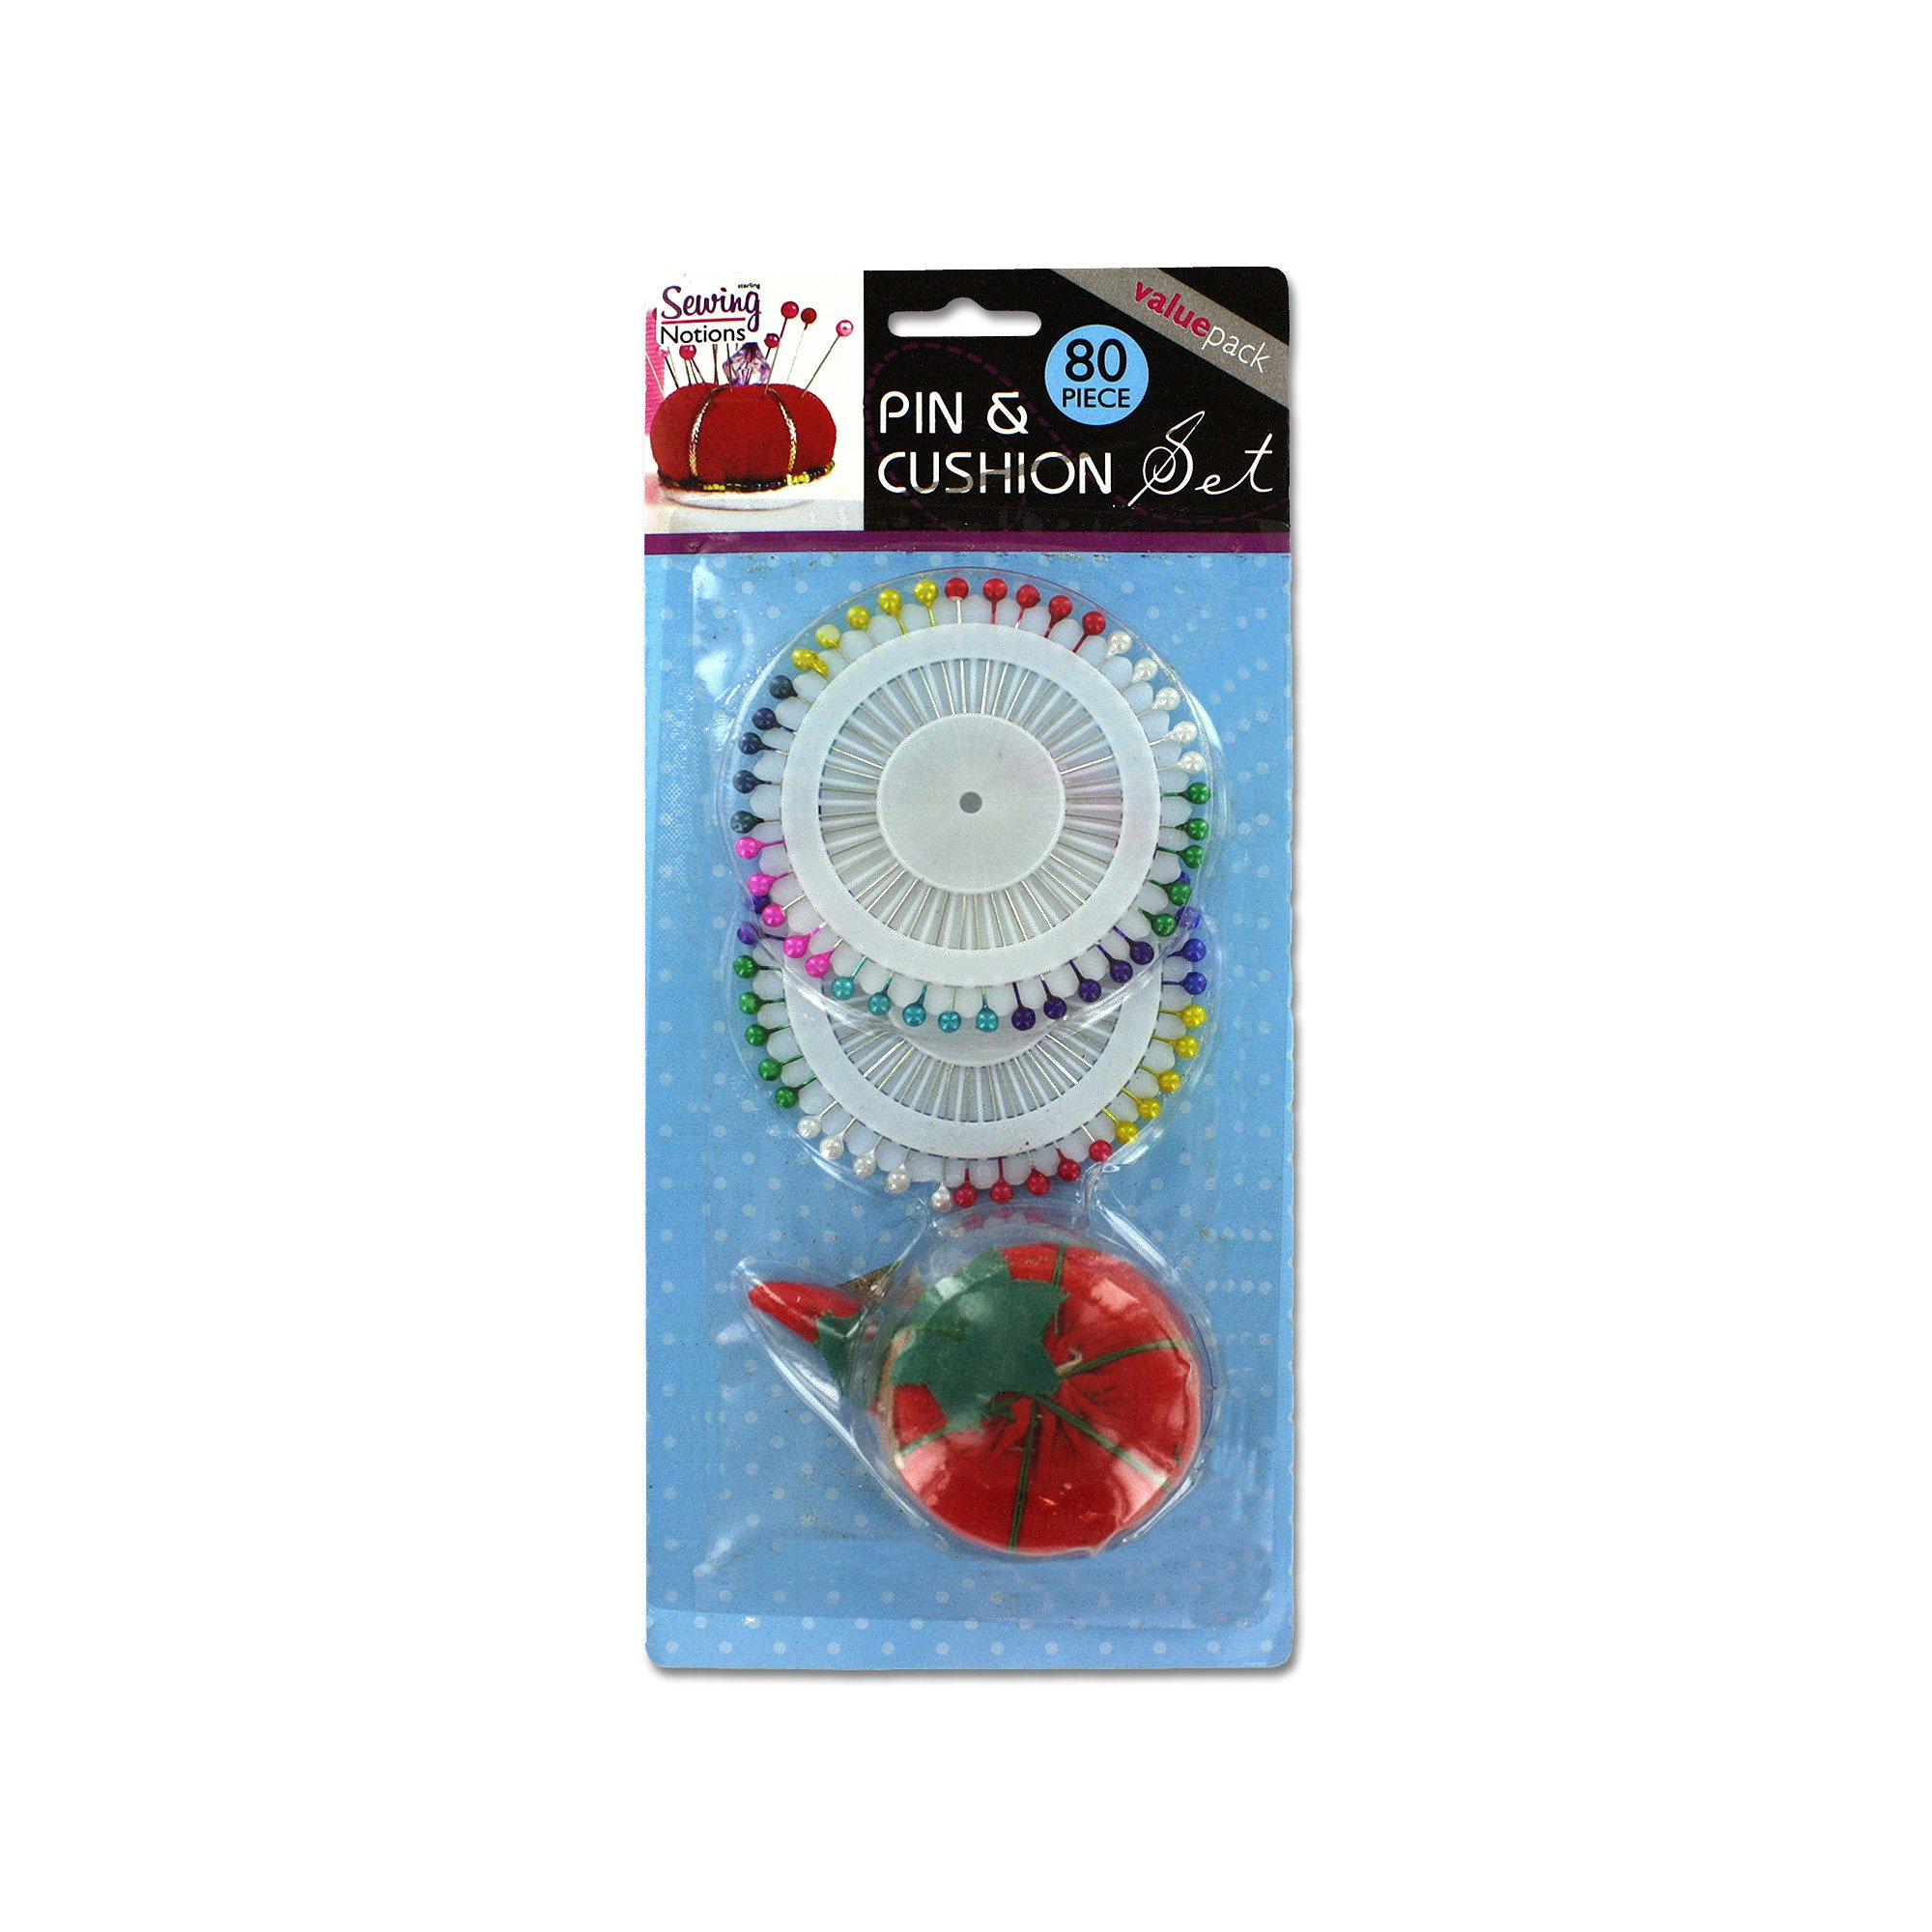 123-Wholesale - Set of 36 Pins & Cushion Set - Sewing & Needlecrafts Pins & Pin Cushions by 123-Wholesale